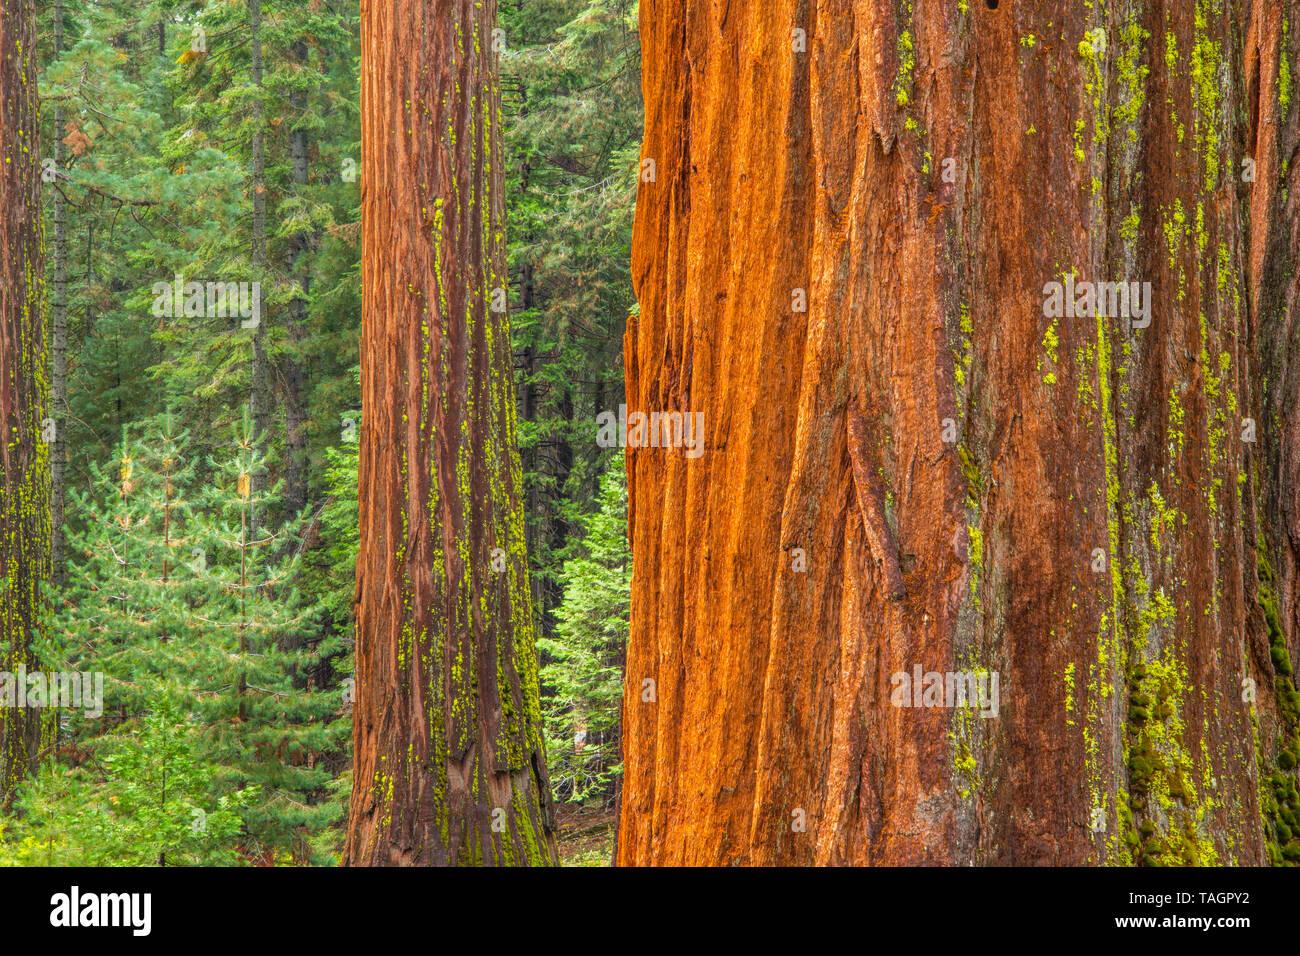 Redwood trees (Sequoiadendron giganteum), Mariposa grove, Yosemite NP, California, USA, by Bill Lea/Dembinsky Photo Assoc - Stock Image